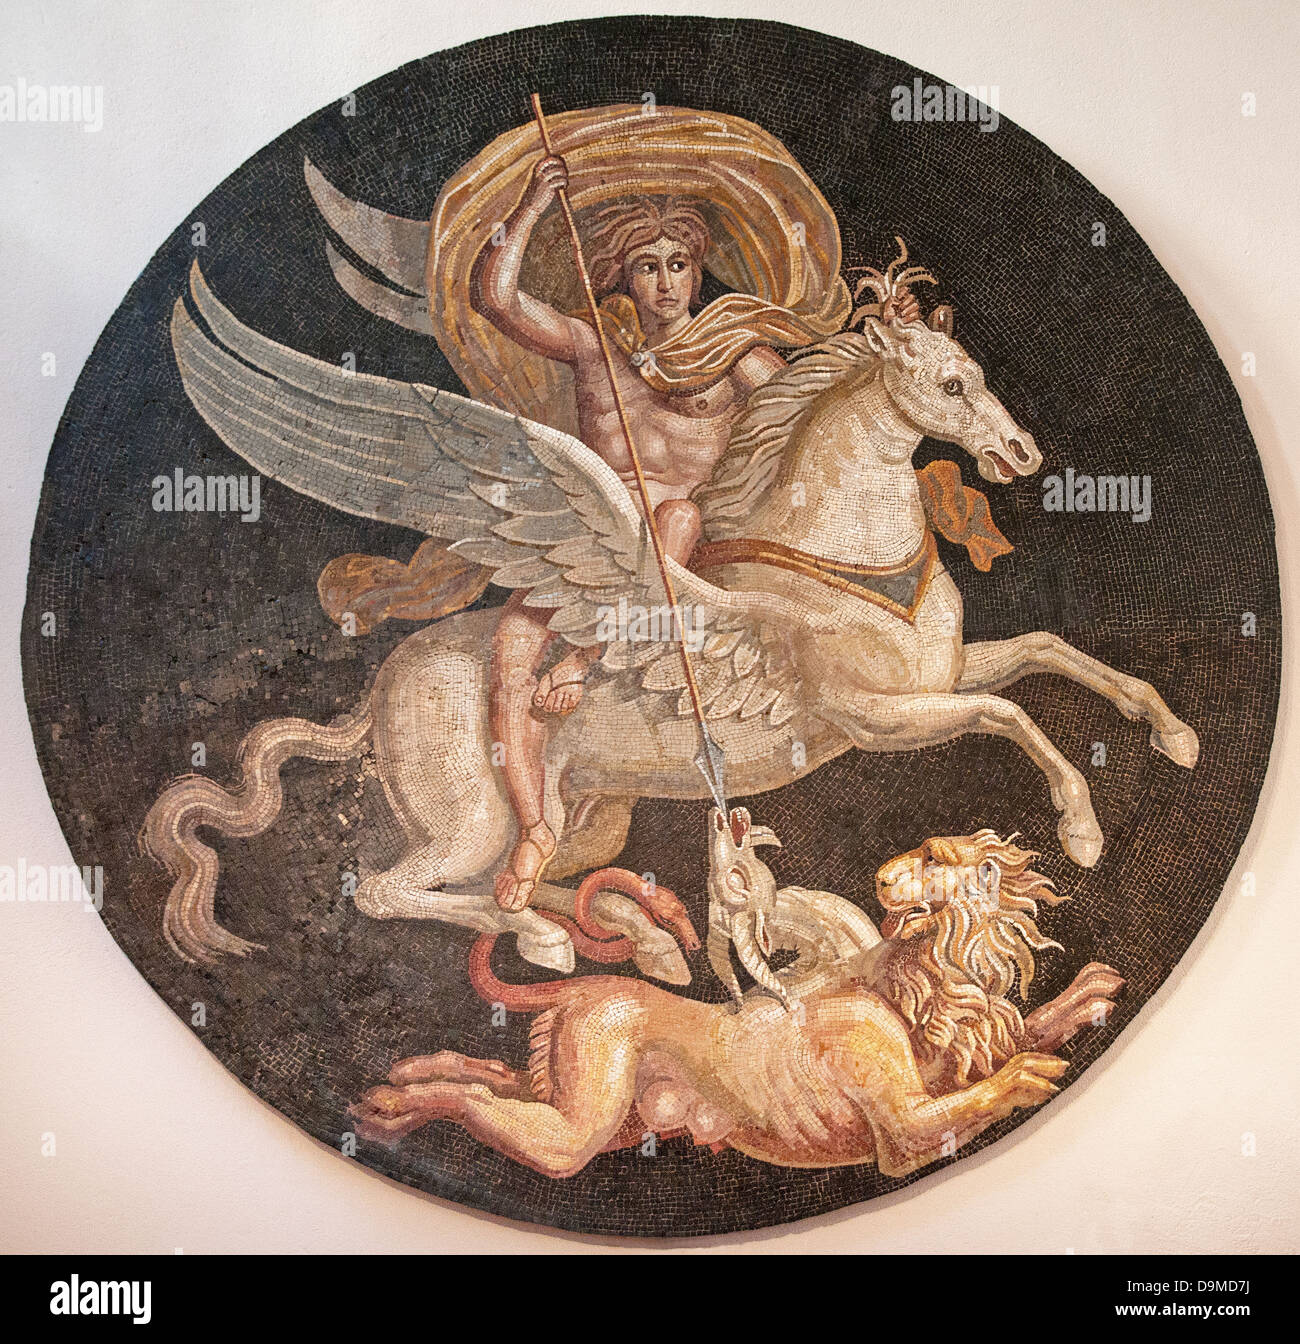 Roman mosaic of ancient Greek Hero Bellerofon killing monster Chimera displayed in Museum Rolin Autun France - Stock Image